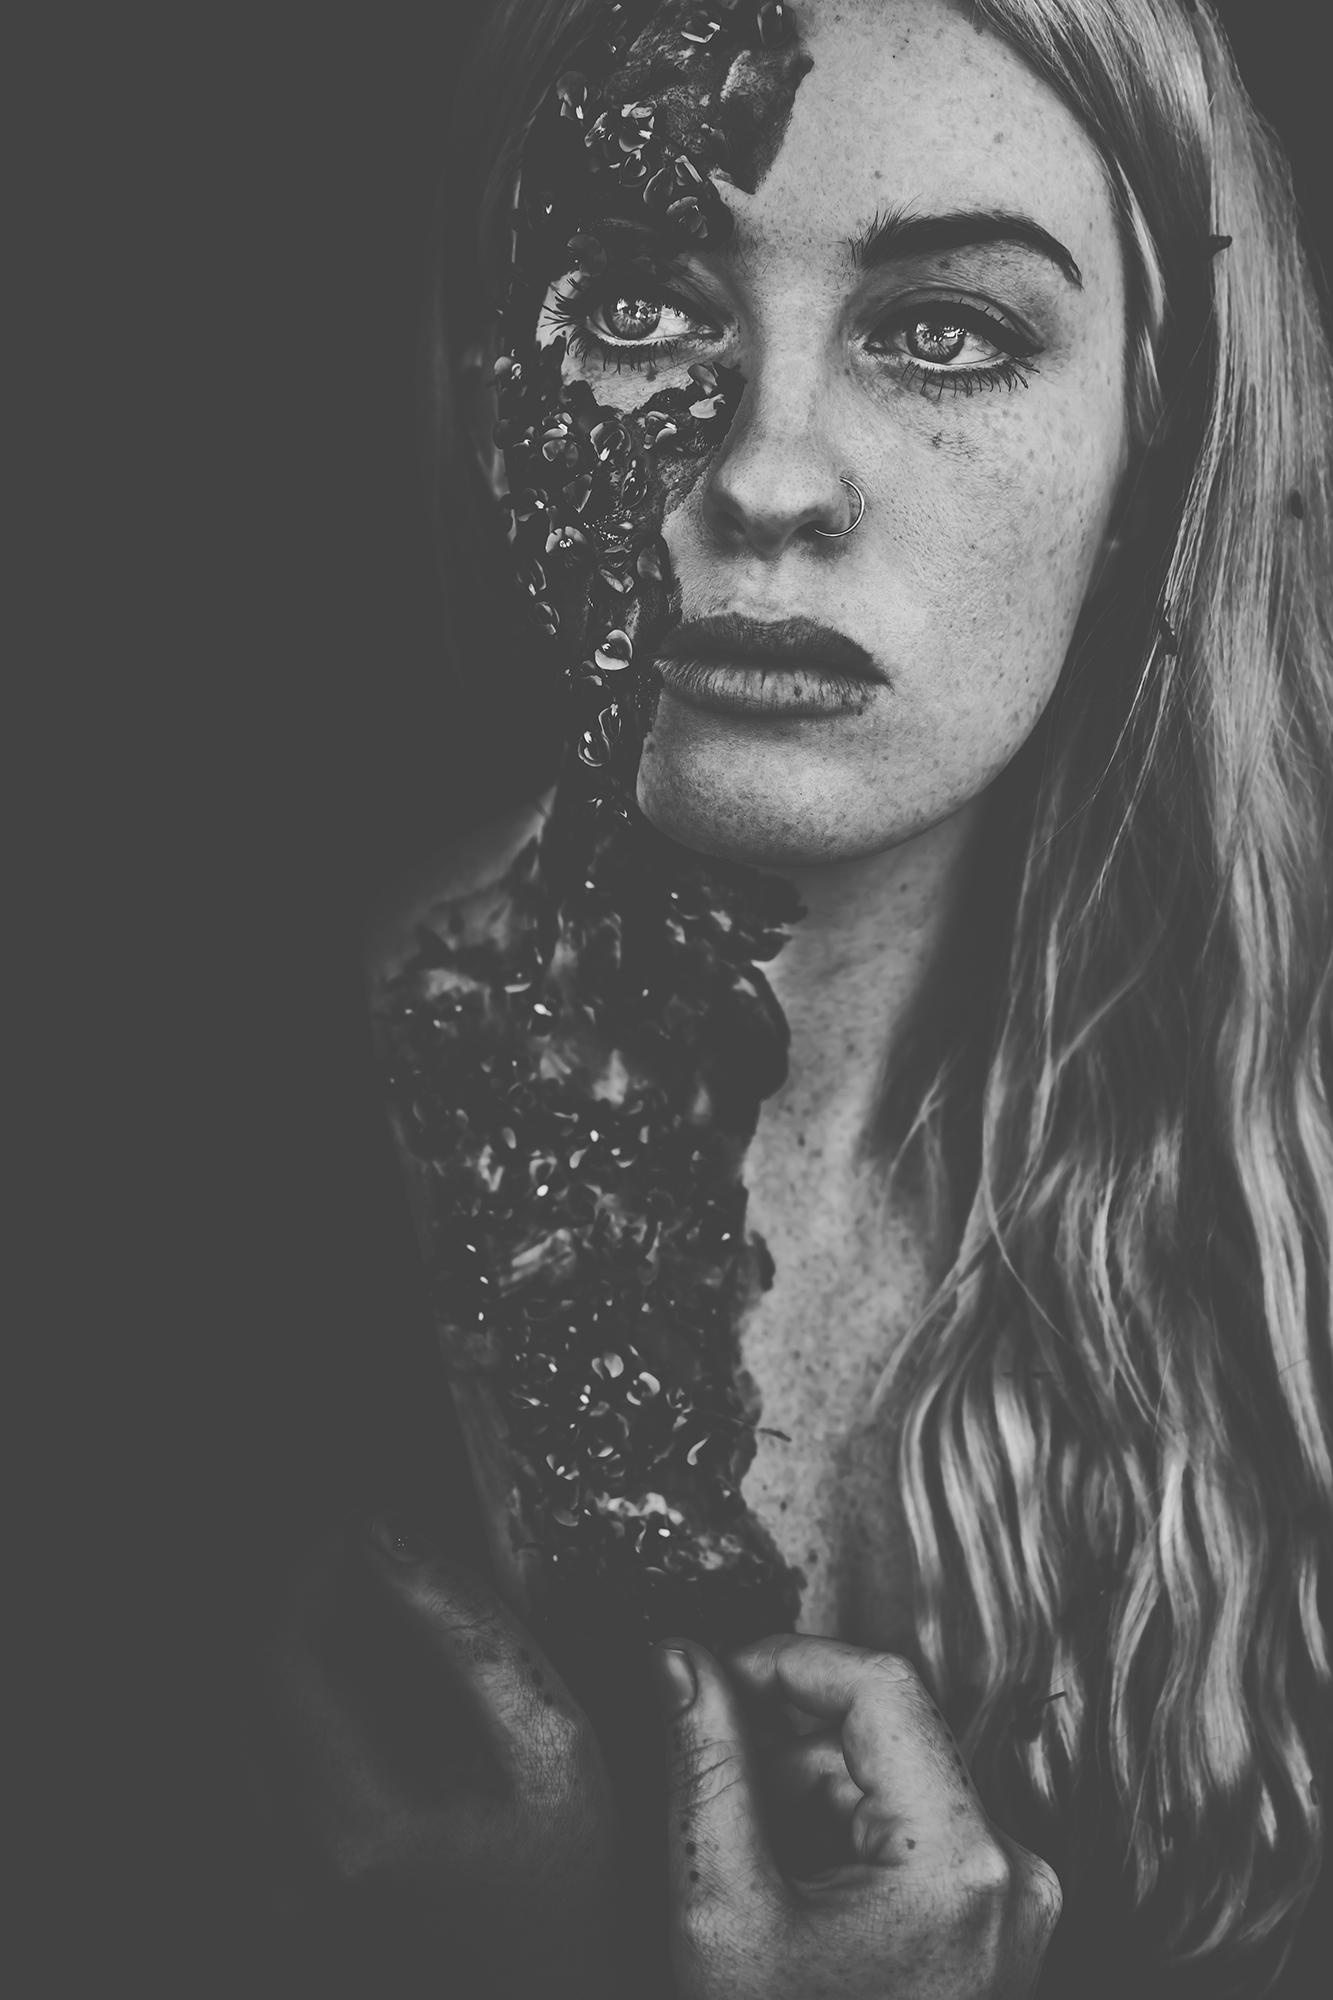 Abigail <b>Marie – Katy</b> Somerville - Abigail-Marie-Photography-photographybyabigail-Katy-Somerville-makeup-by-model